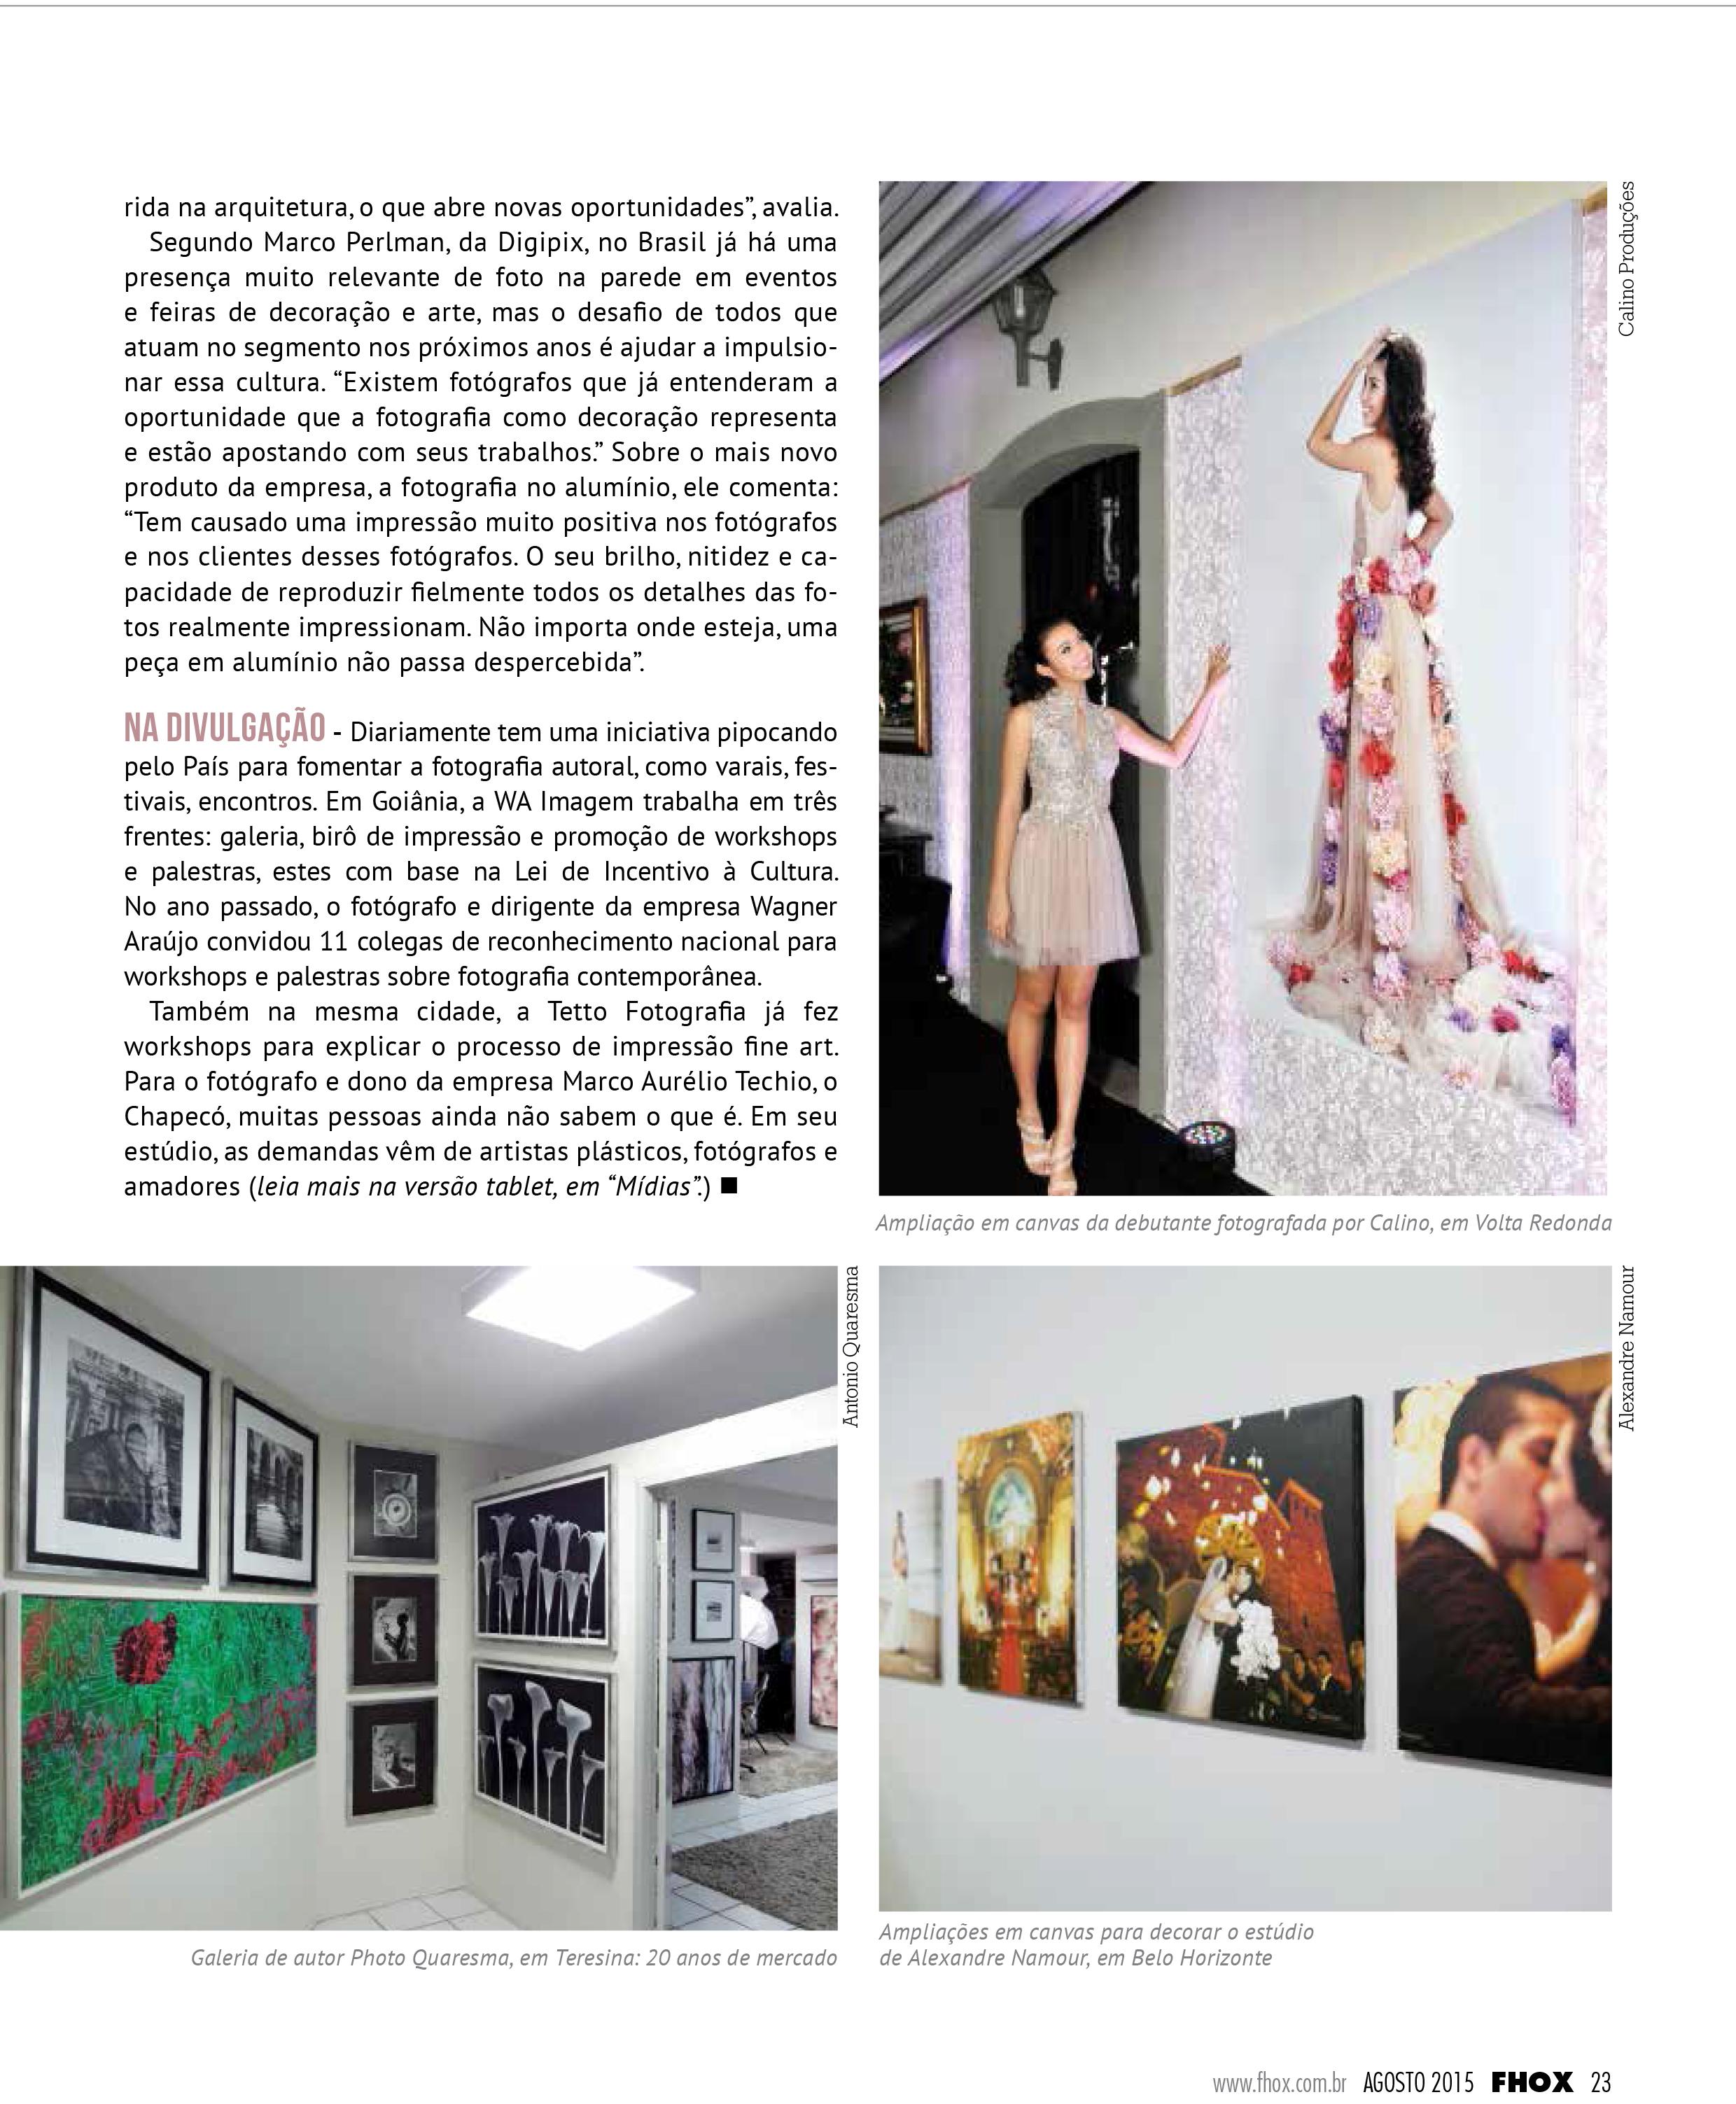 Revista Fhox - página 4